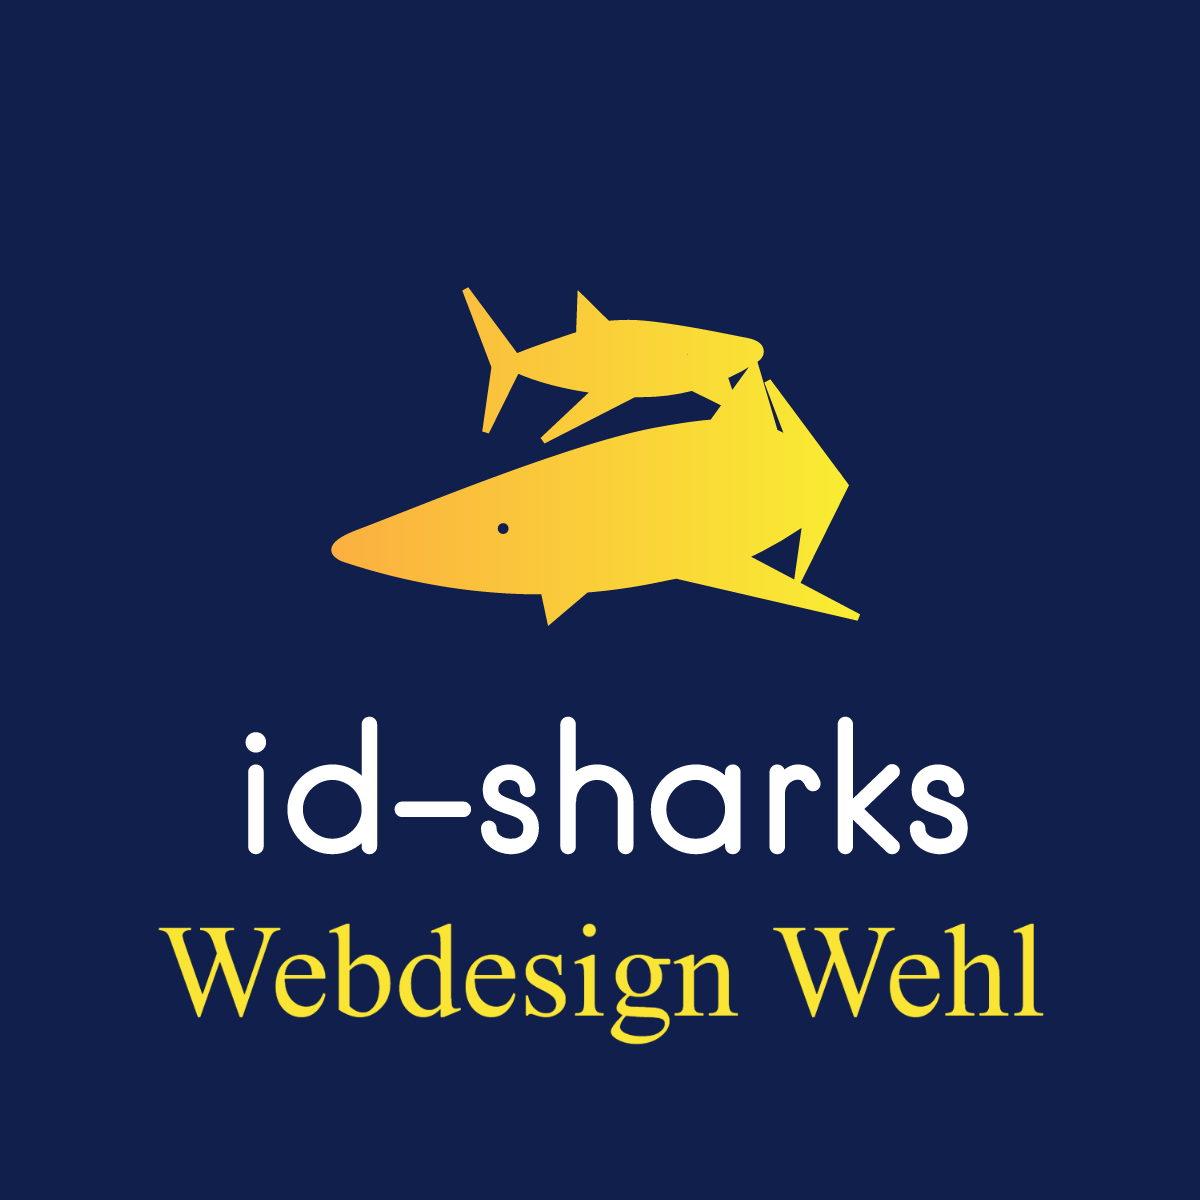 Webdesign Wehl